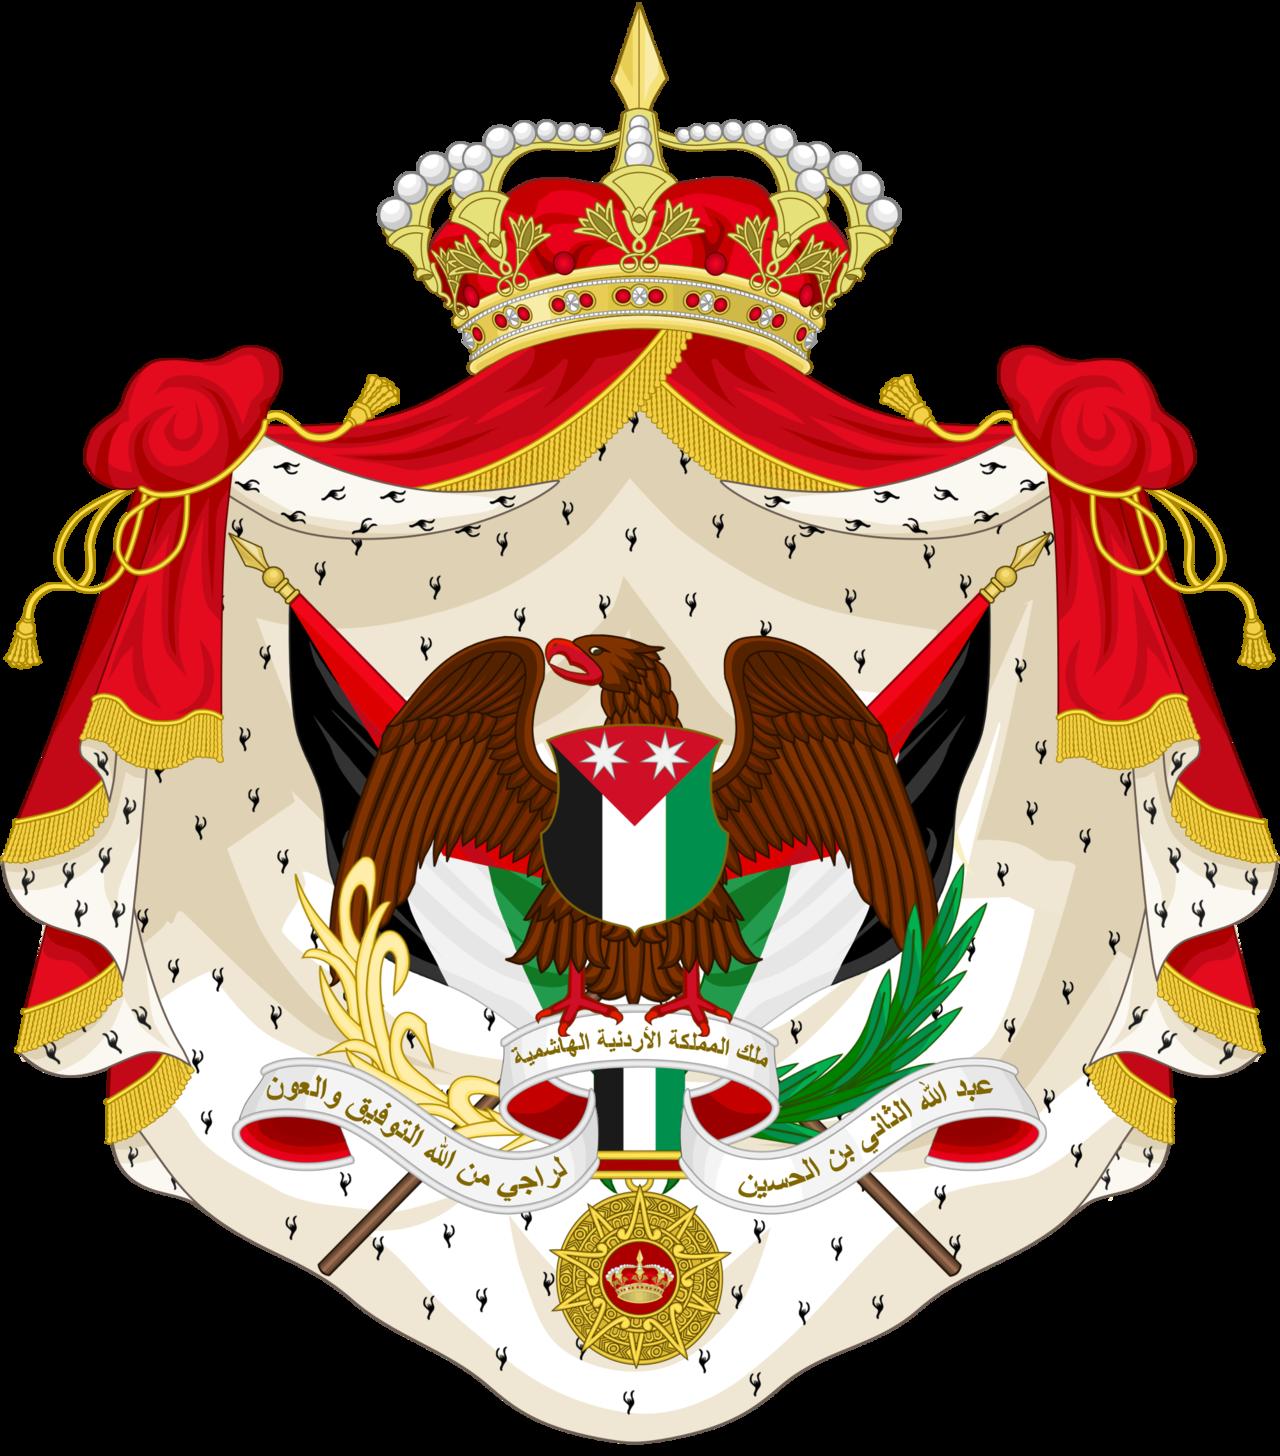 Falcon clipart baaz. Al hashemi dynasty of